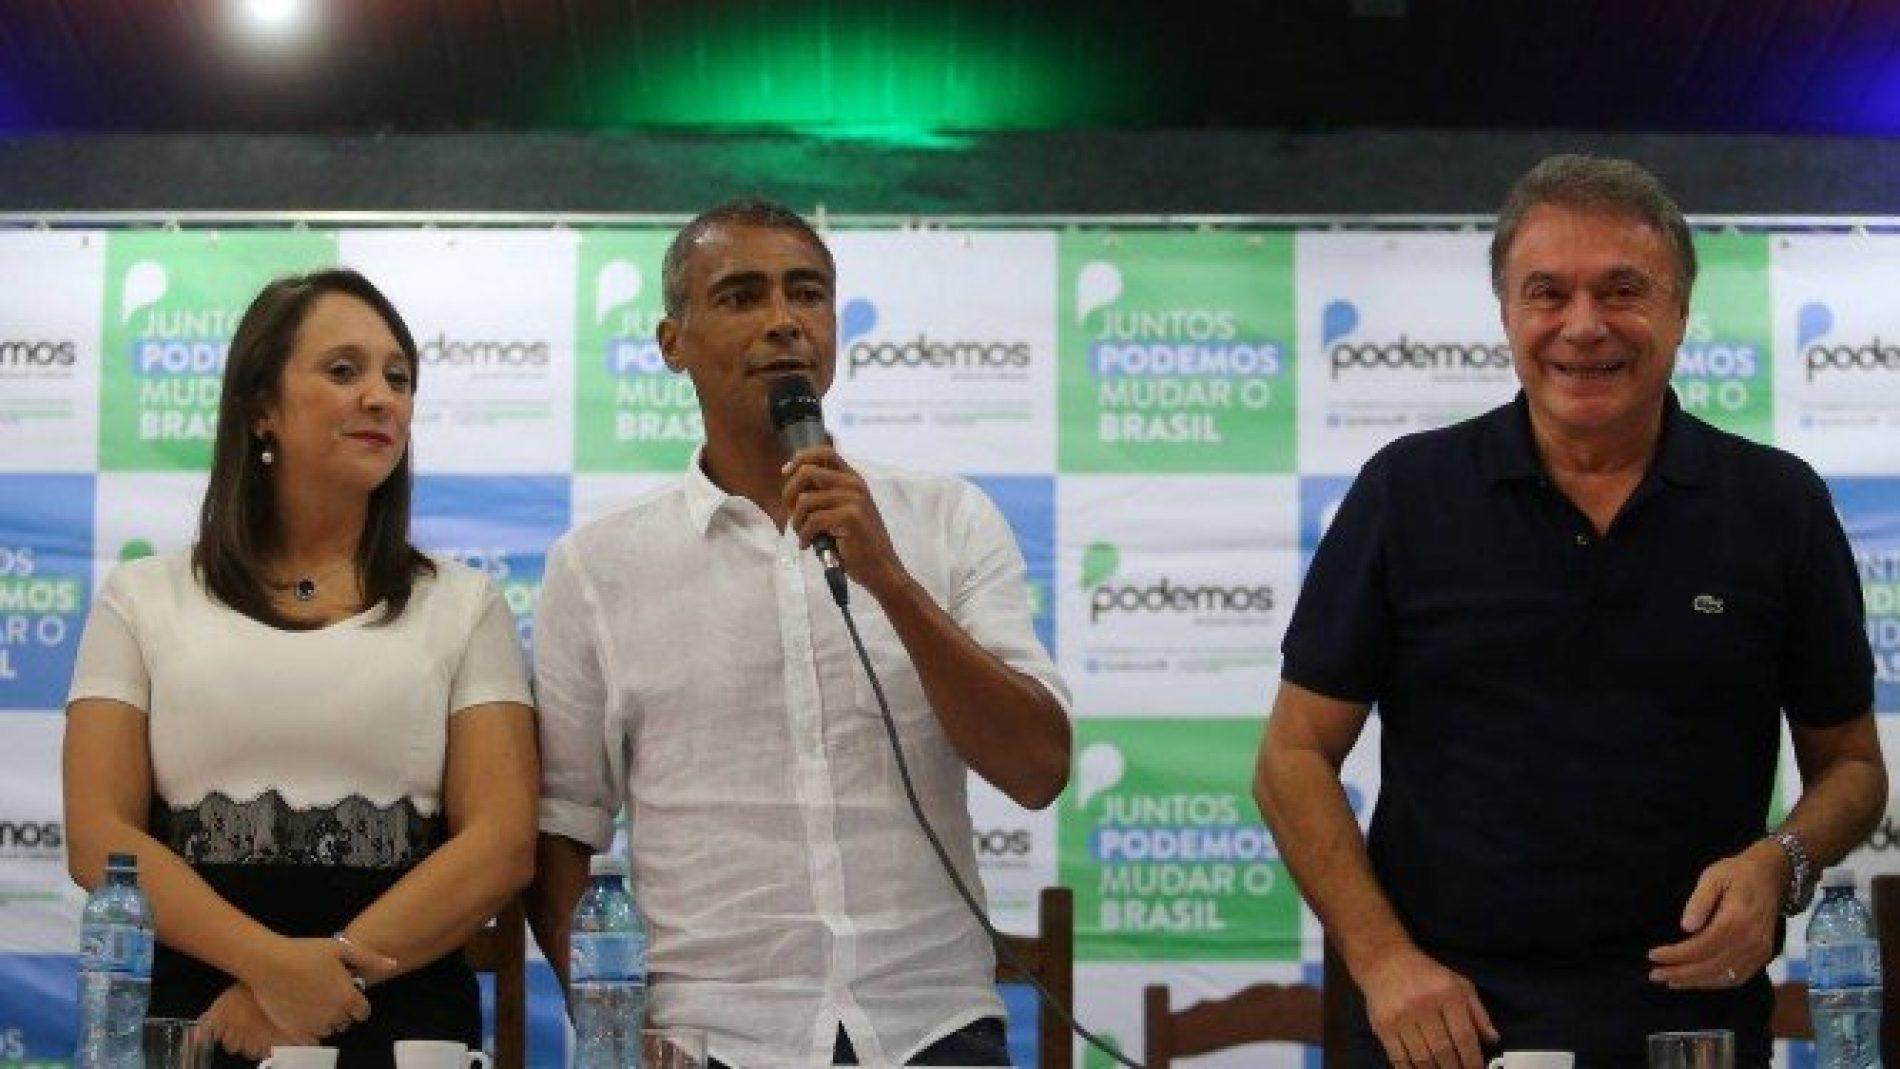 Partido PODEMOS incorpora PHS e vira terceira maior bancada do Senado